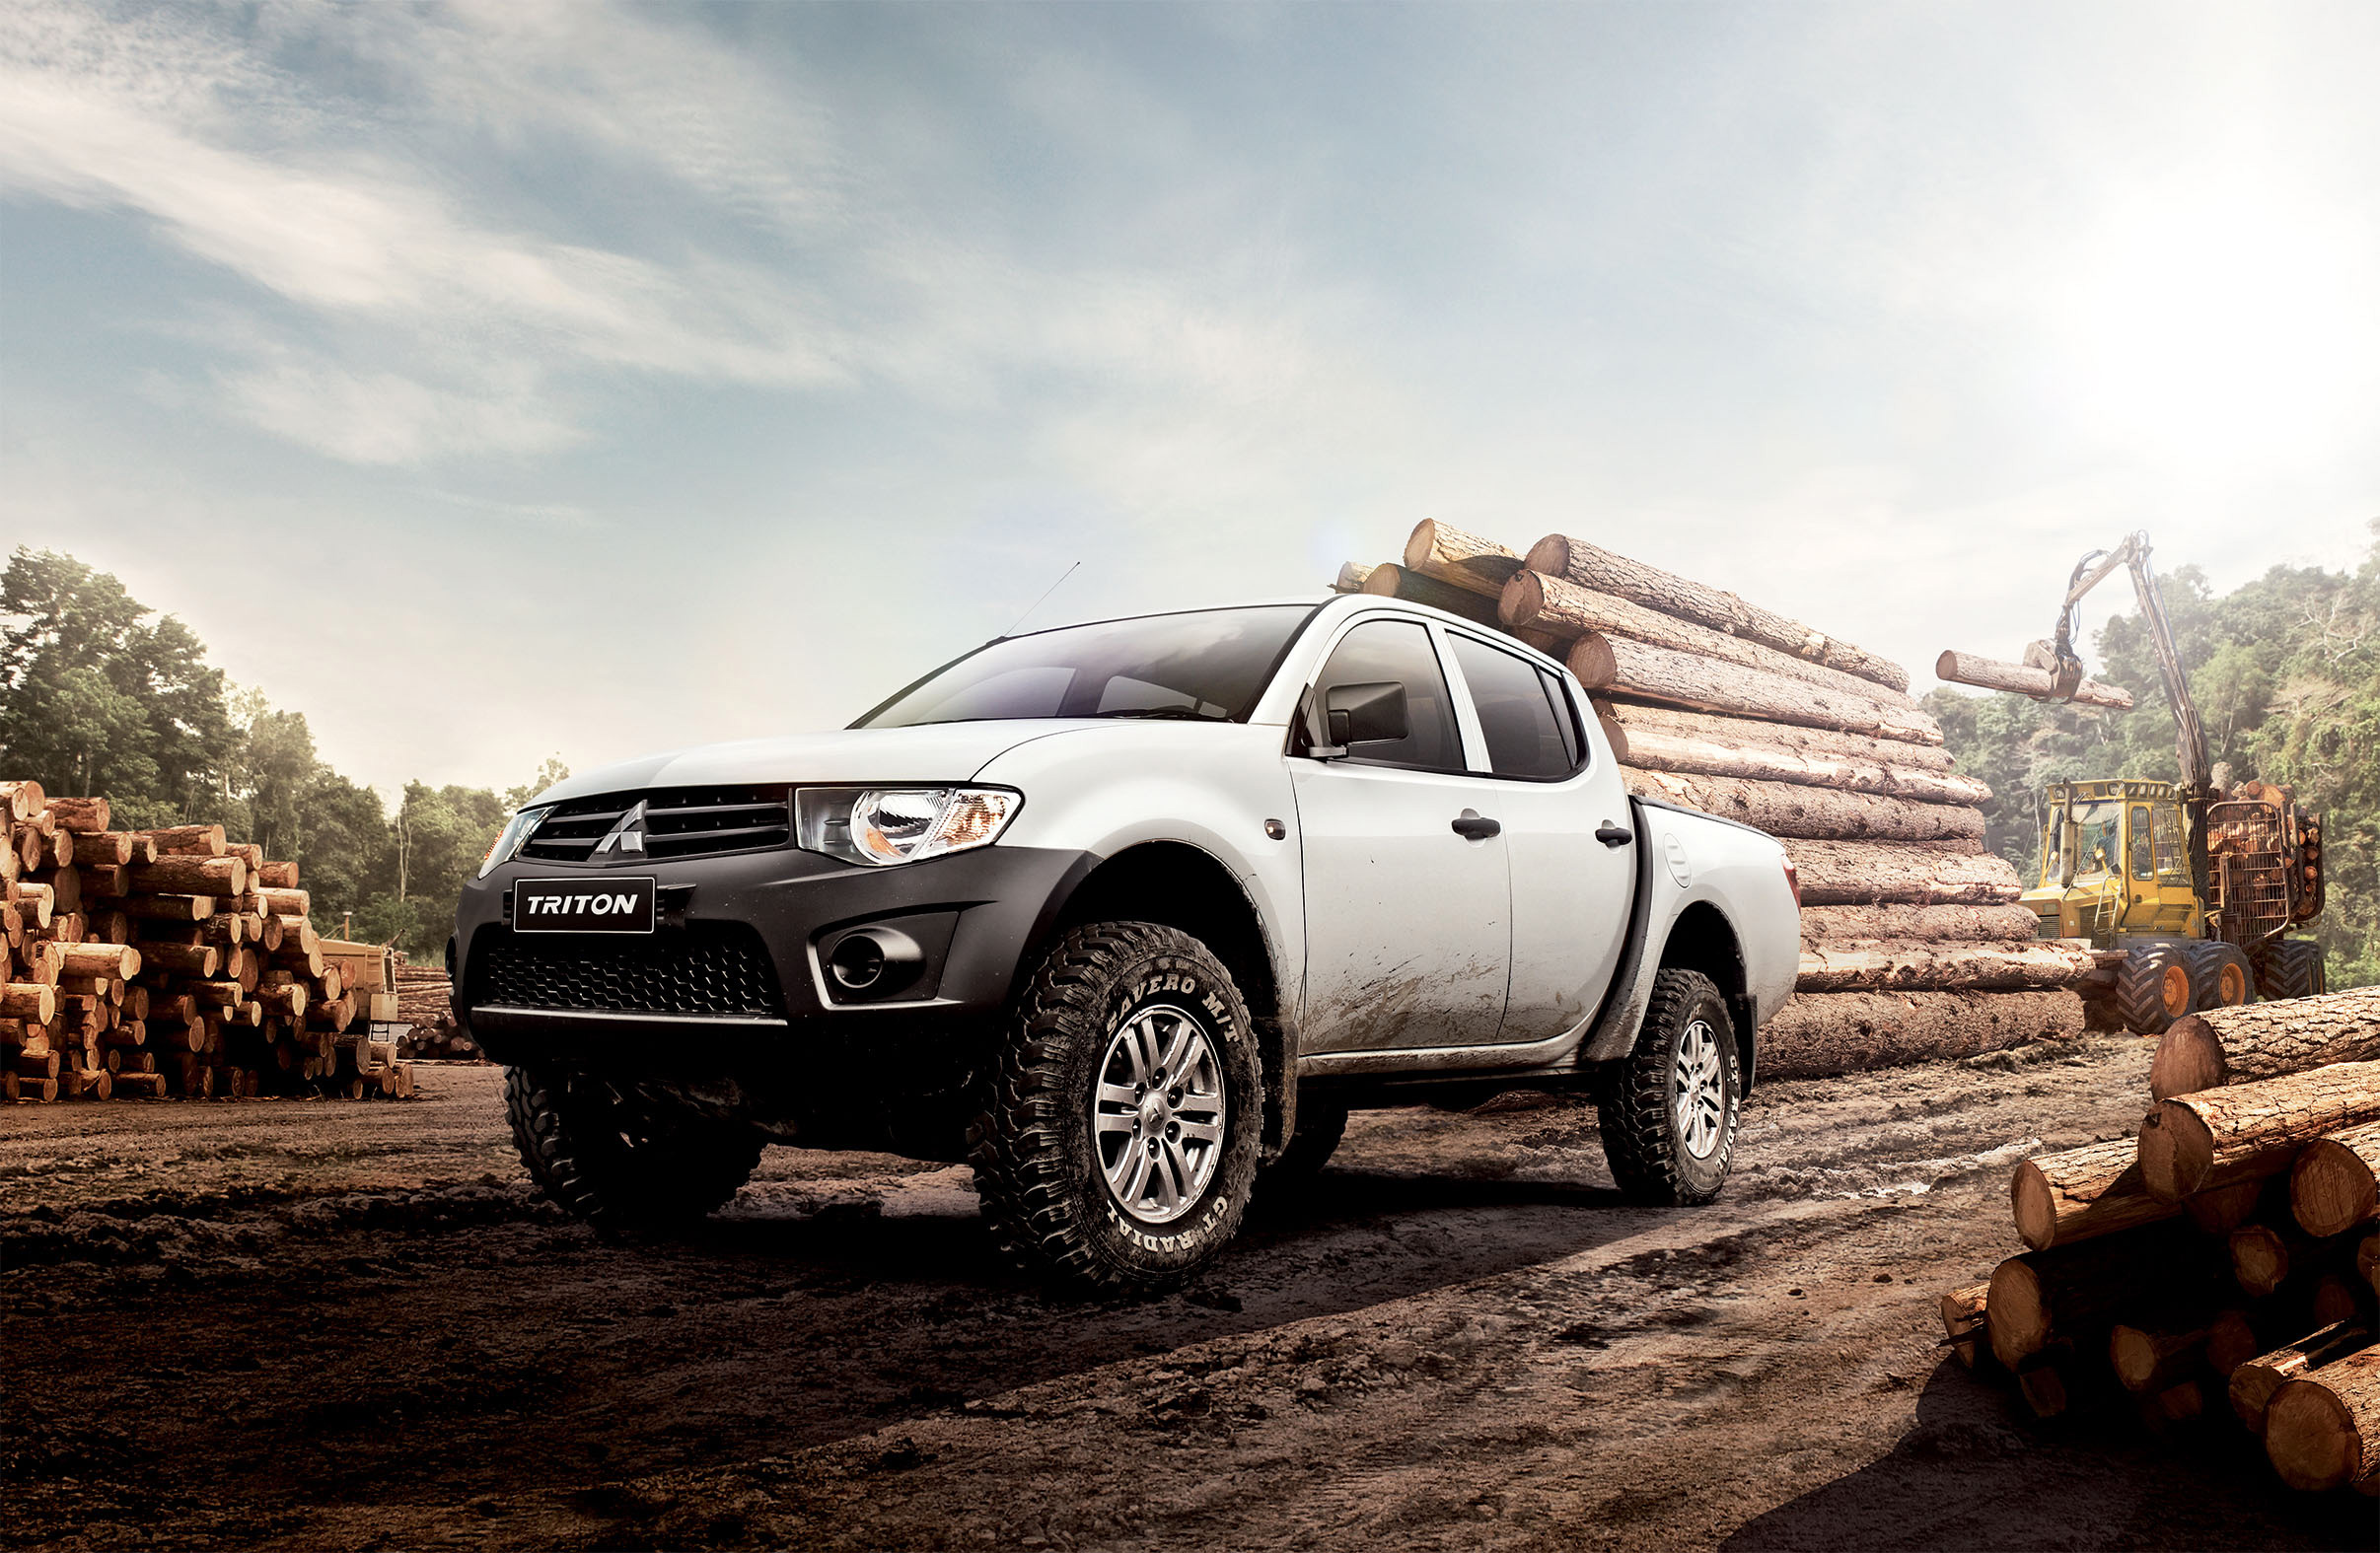 Mitsubishi Triton Heavy Duty Introduced For RMk Standardfit - Mitsubishi registration